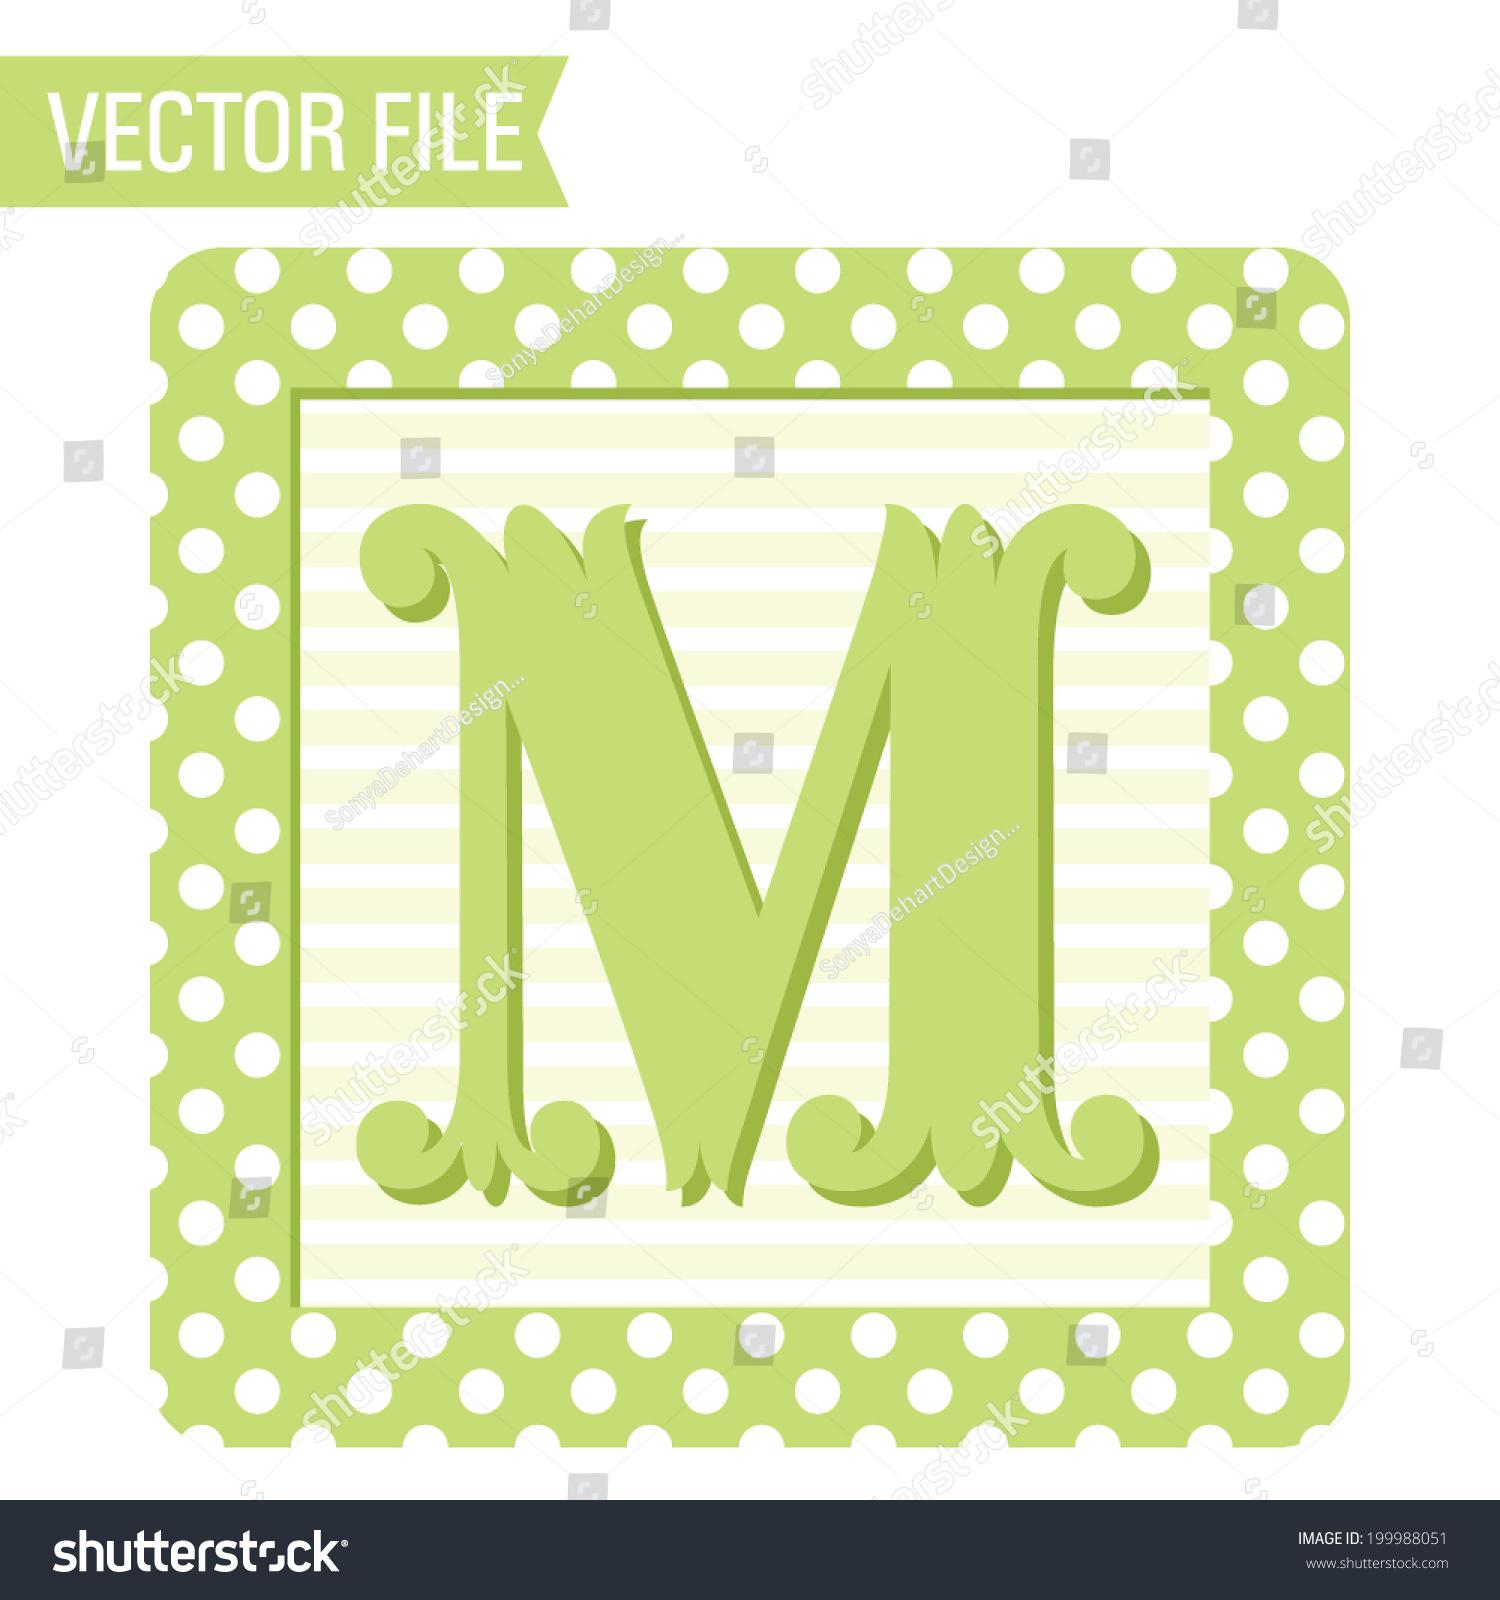 Vector Polka Dots Baby Block Letter Stock Vector